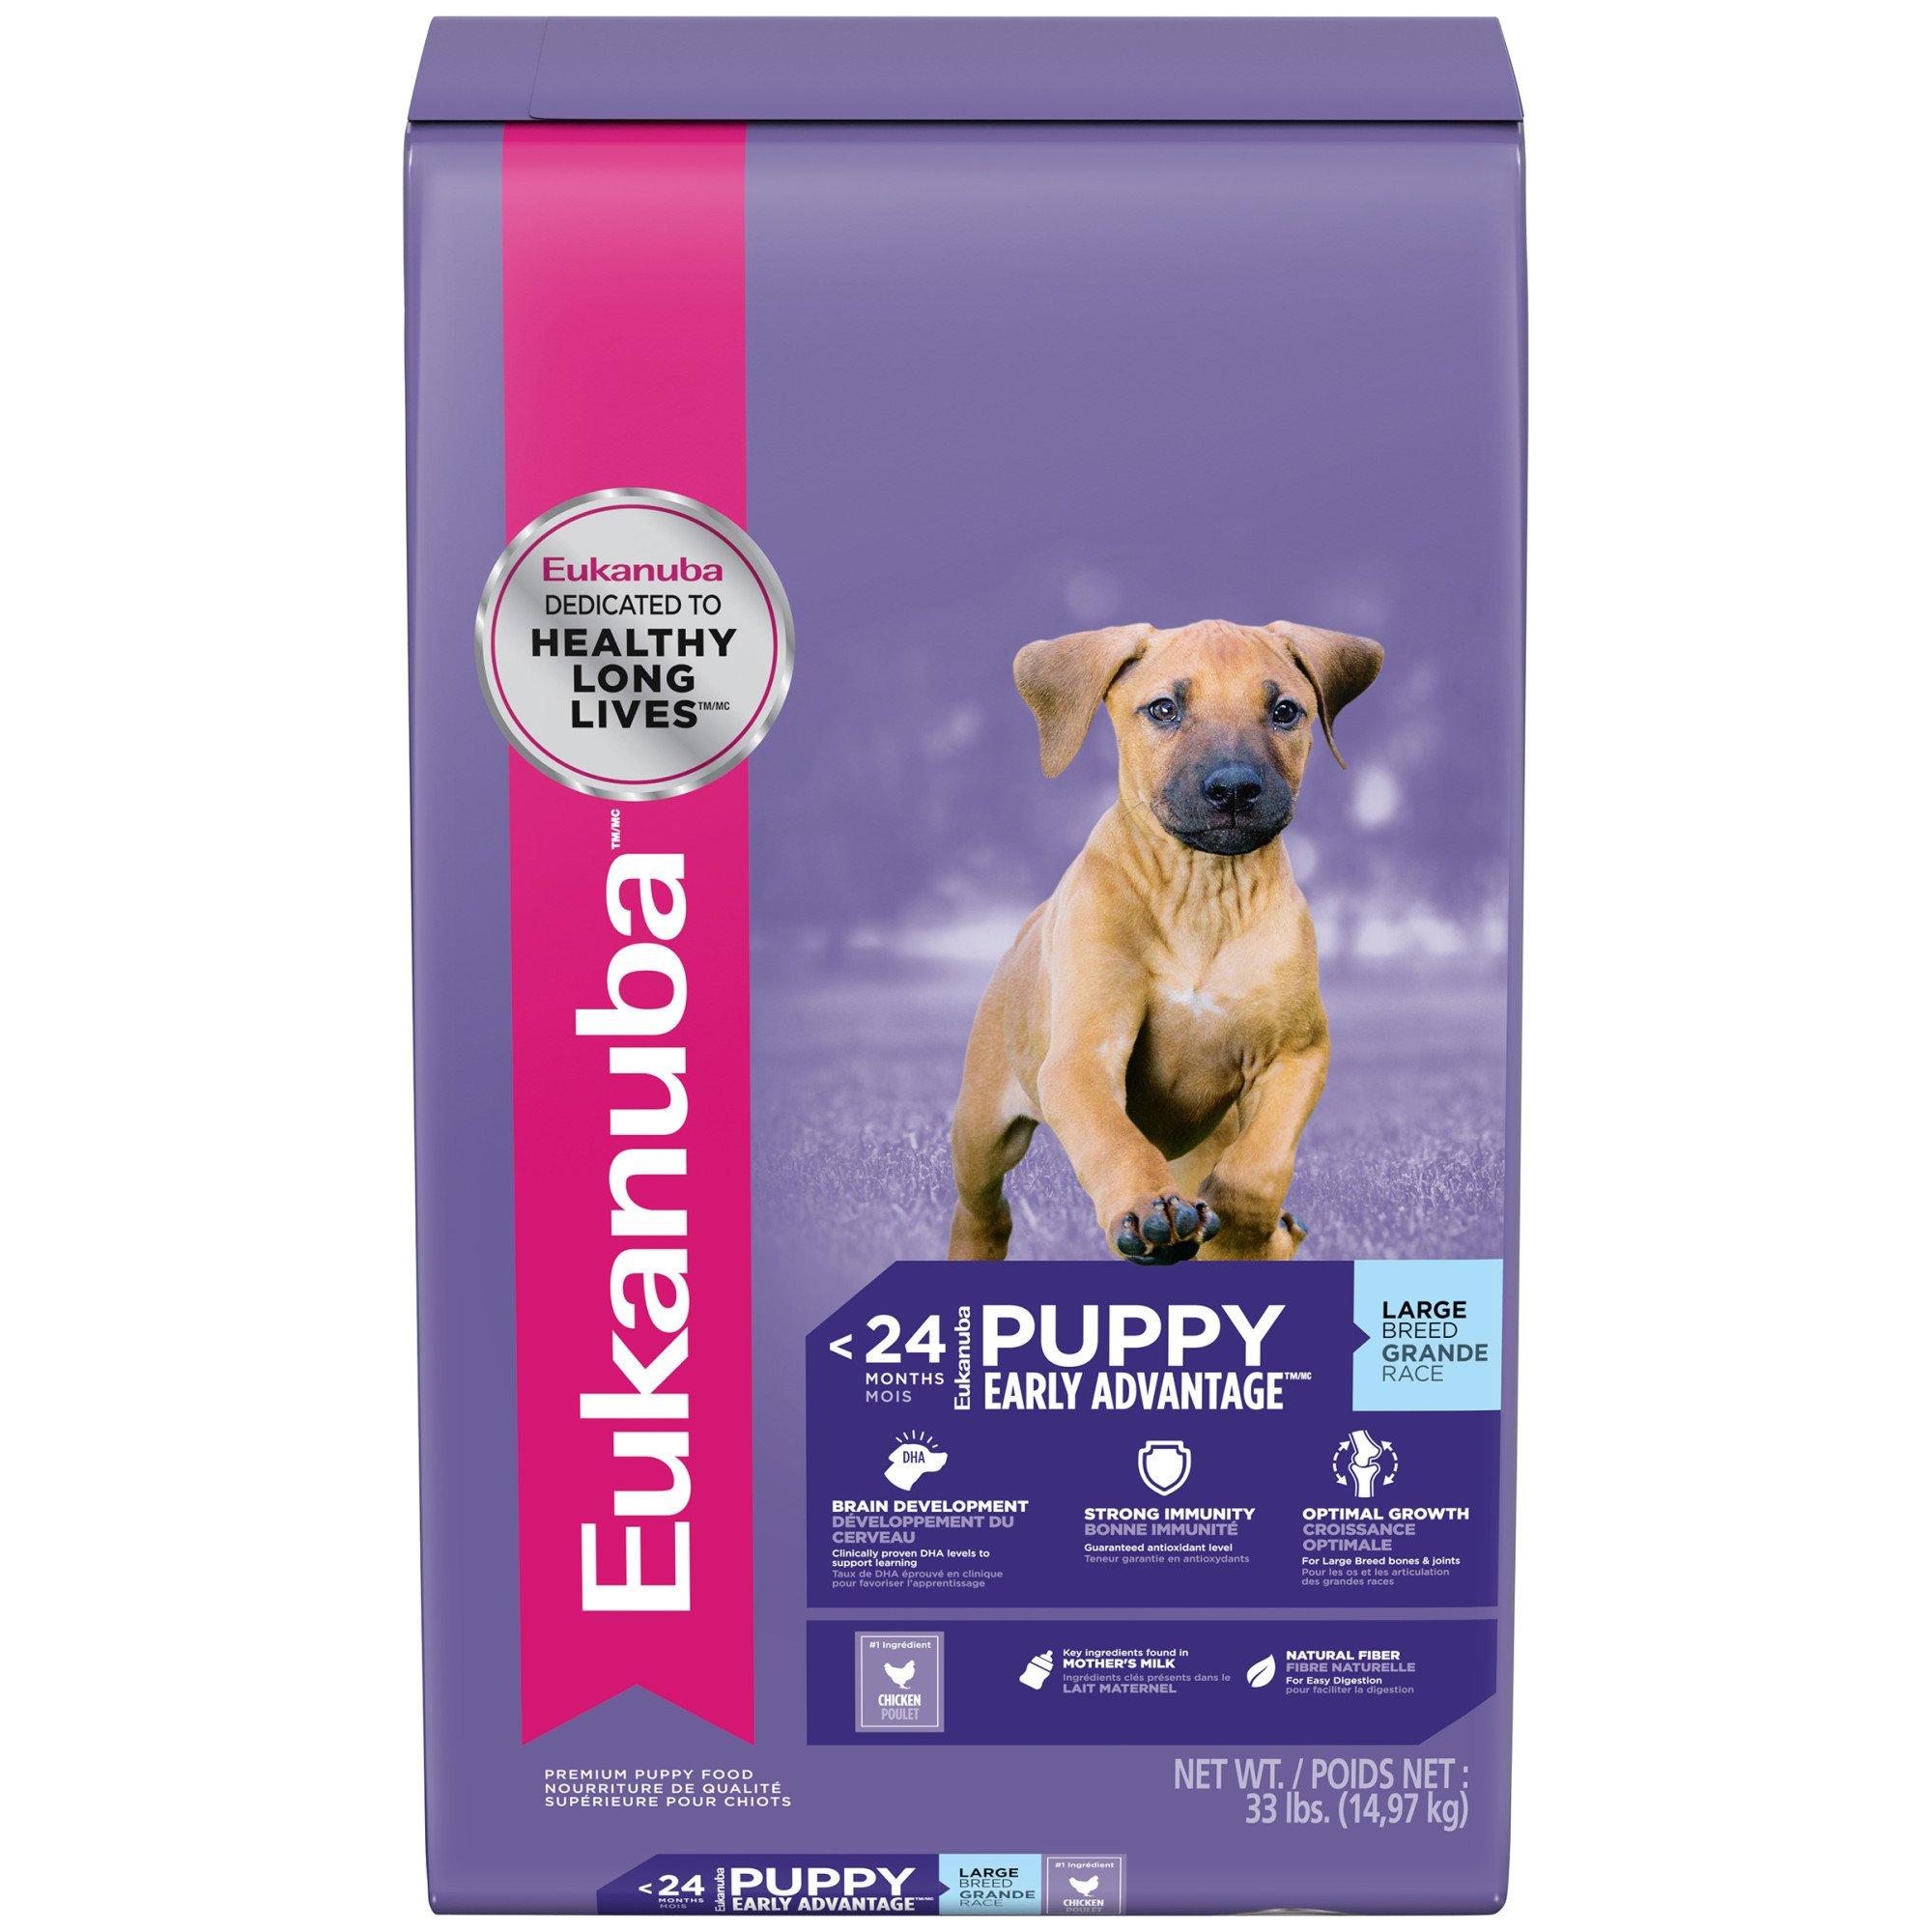 Eukanuba Puppy Food >> Eukanuba Large Breed Puppy Food | Petco